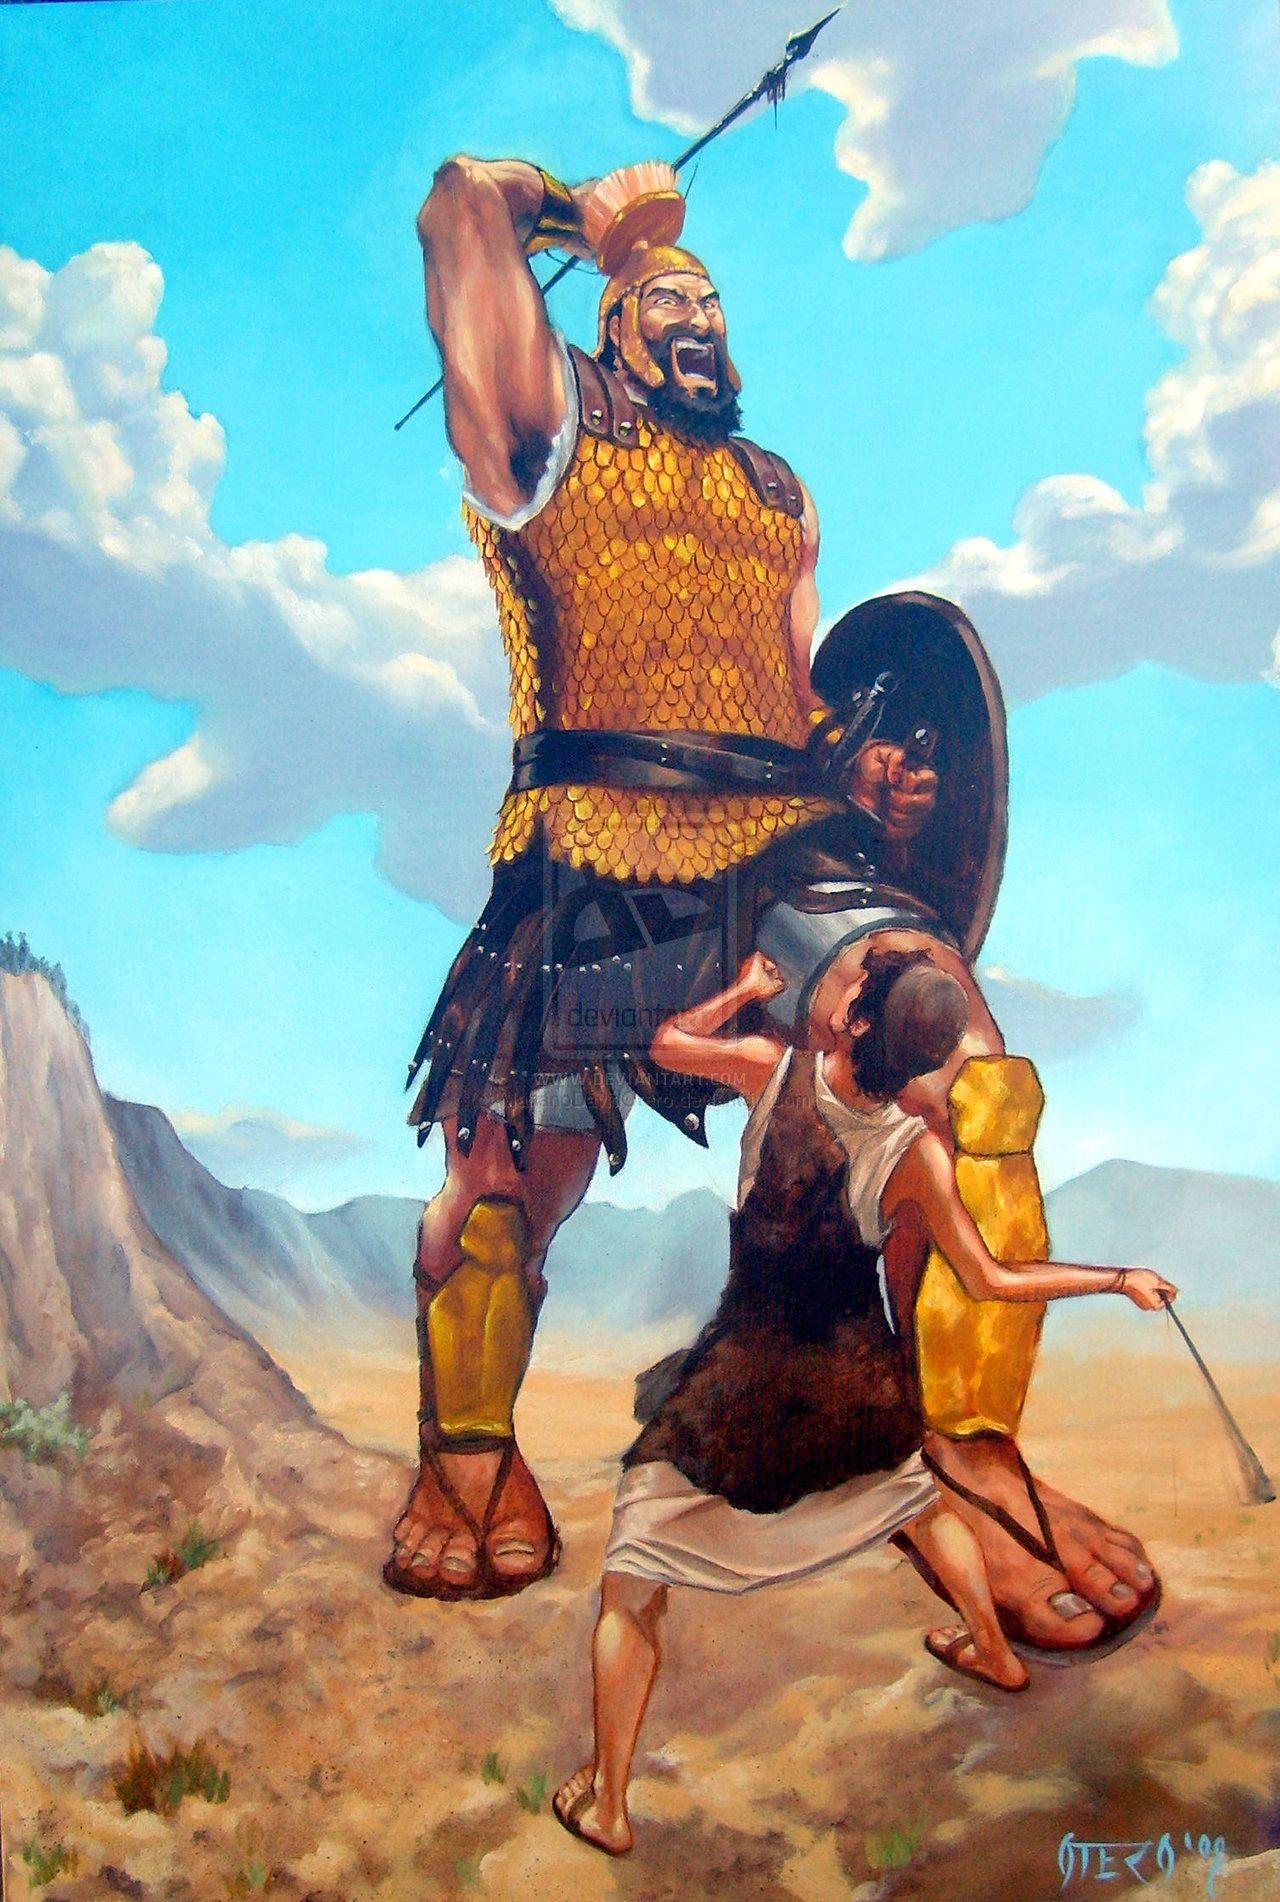 David Vs. Goliath by MarianoDavidOtero on deviantART | David bible, David and goliath, Bible heroes